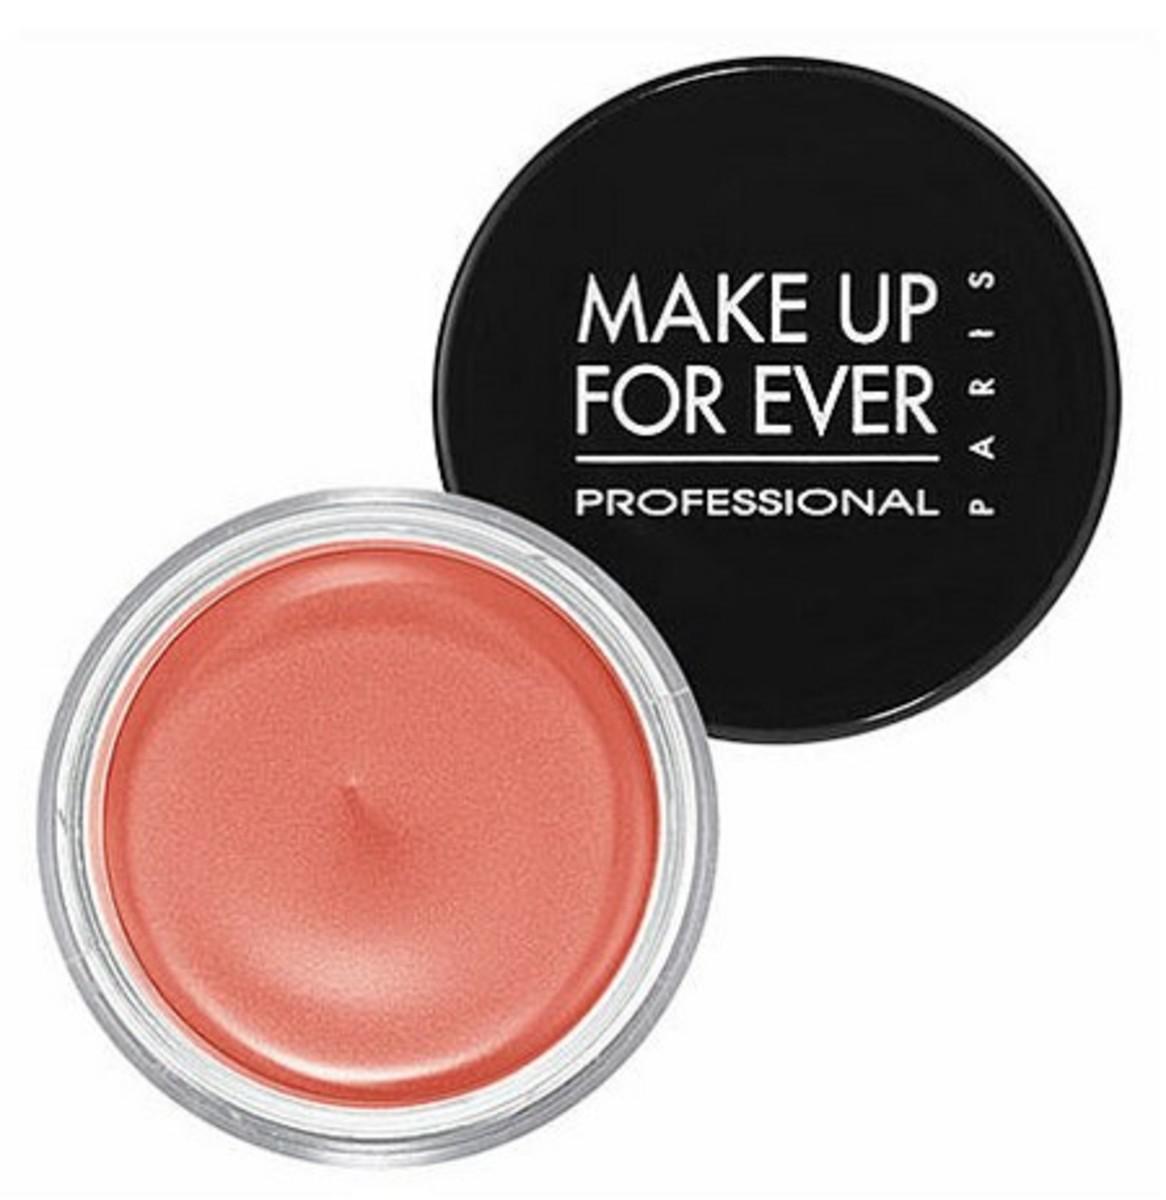 Make Up For Ever Aqua Cream Waterproof Cream Color in Peach